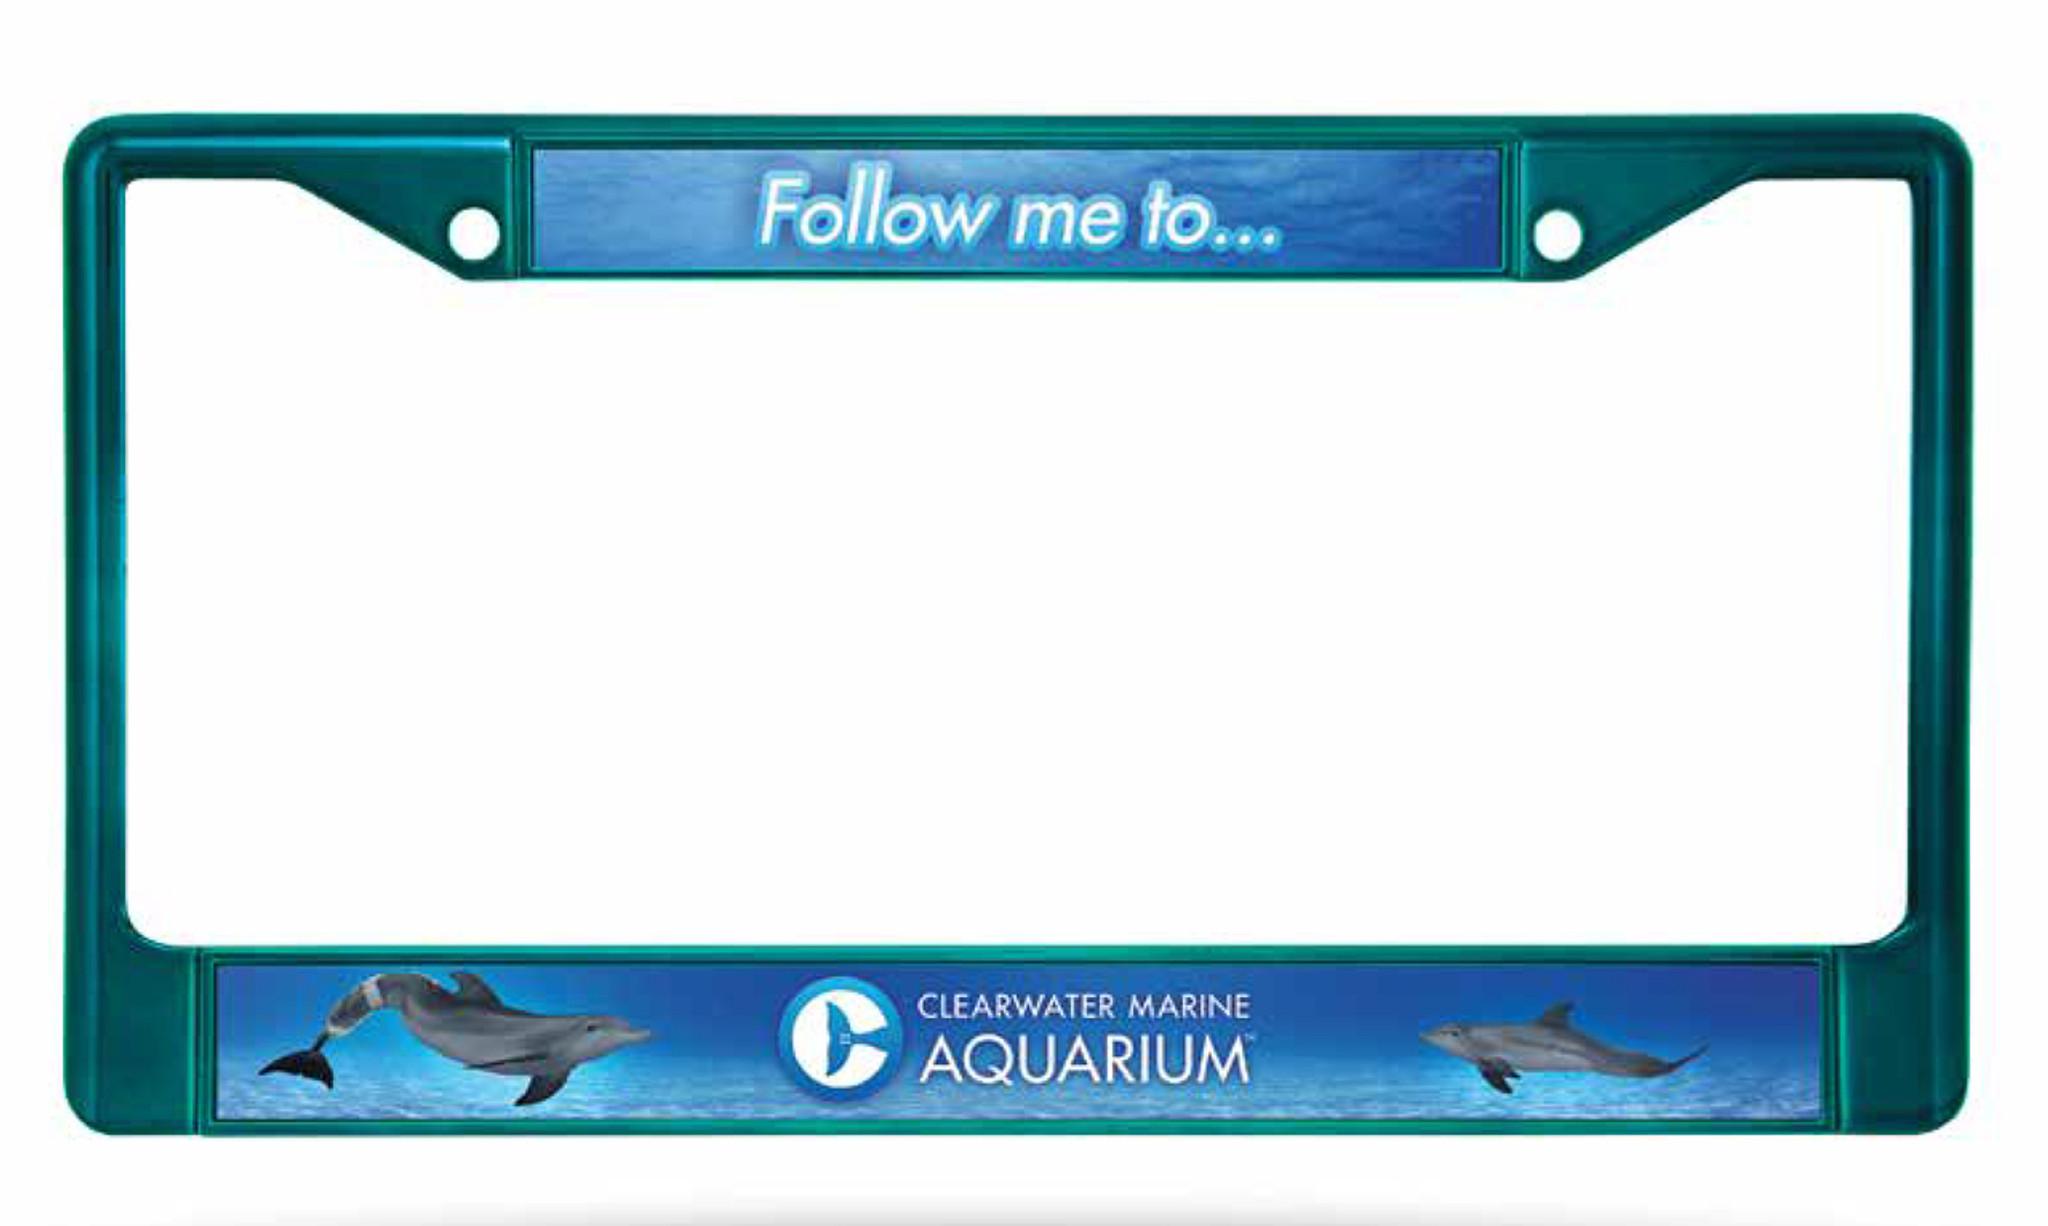 Clearwater Marine Aquarium Winter & Hope License Plate Frame | Gift Shop